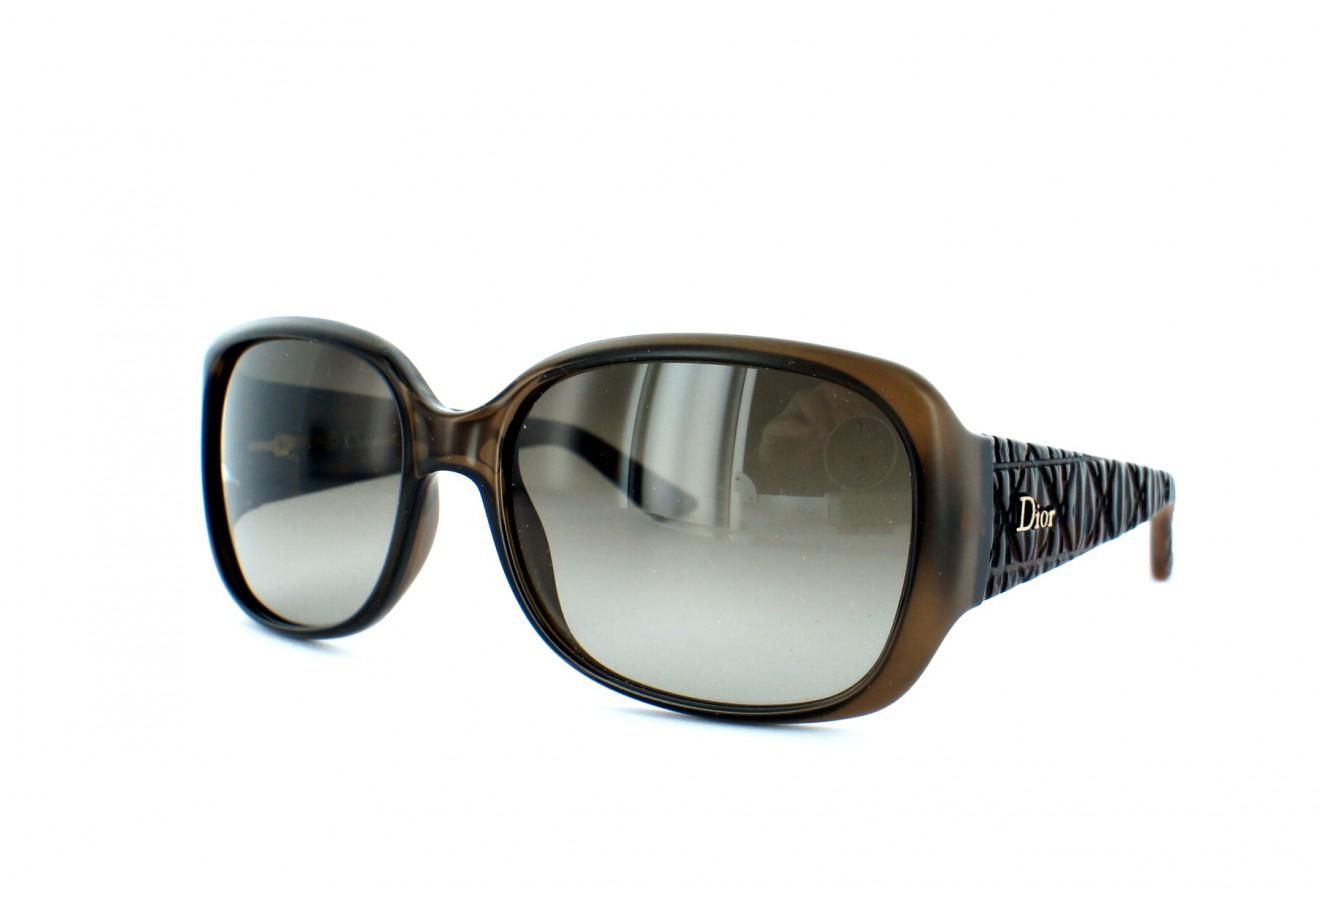 lunettes de soleil dior dior frisson 2 bil ha 56 17. Black Bedroom Furniture Sets. Home Design Ideas